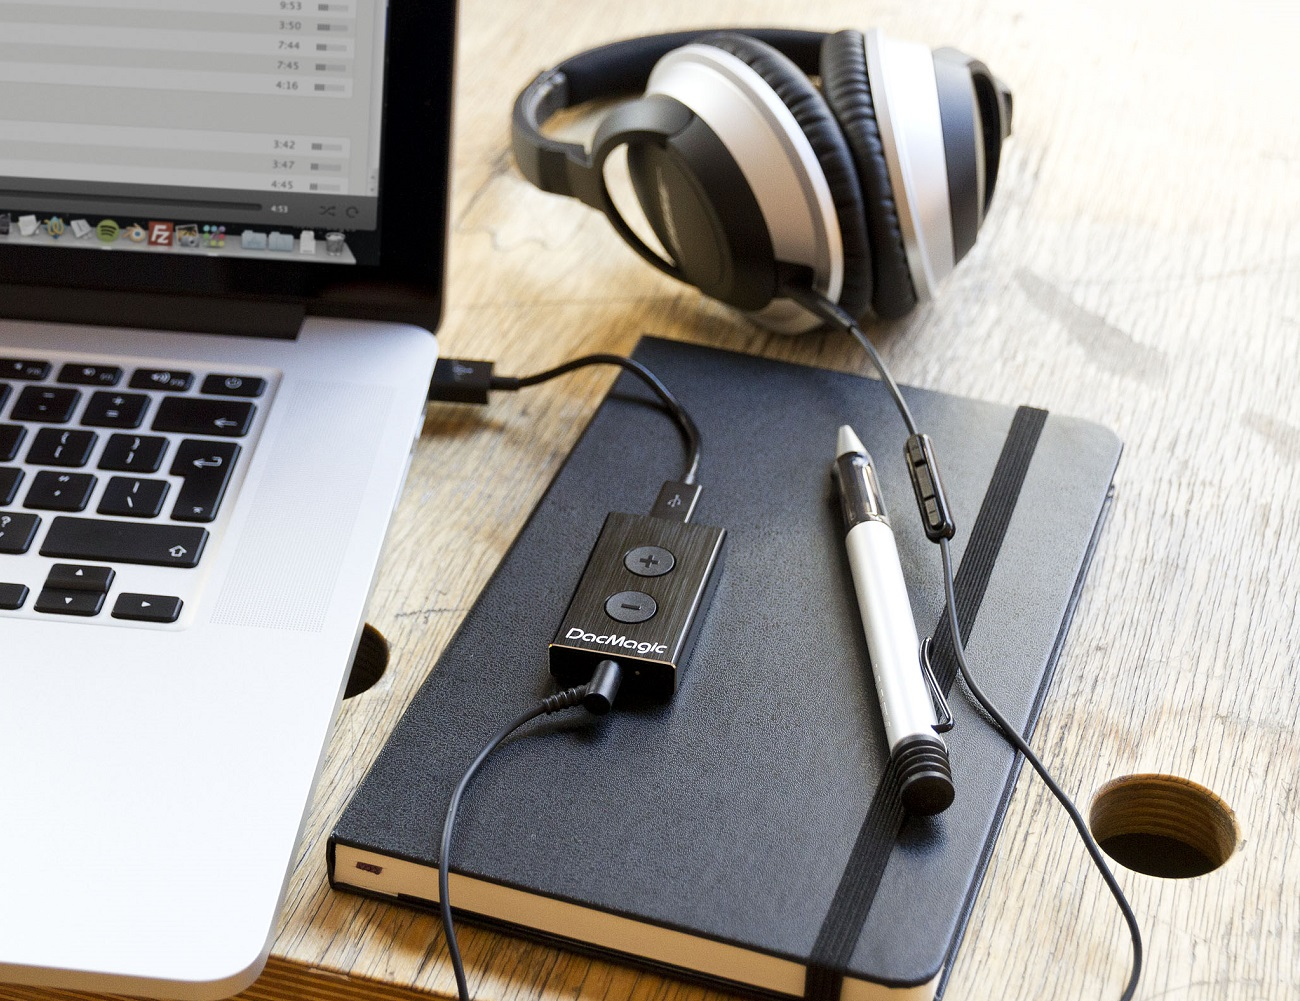 Cambridge Audio DACMagic XS Headphone Amplifier